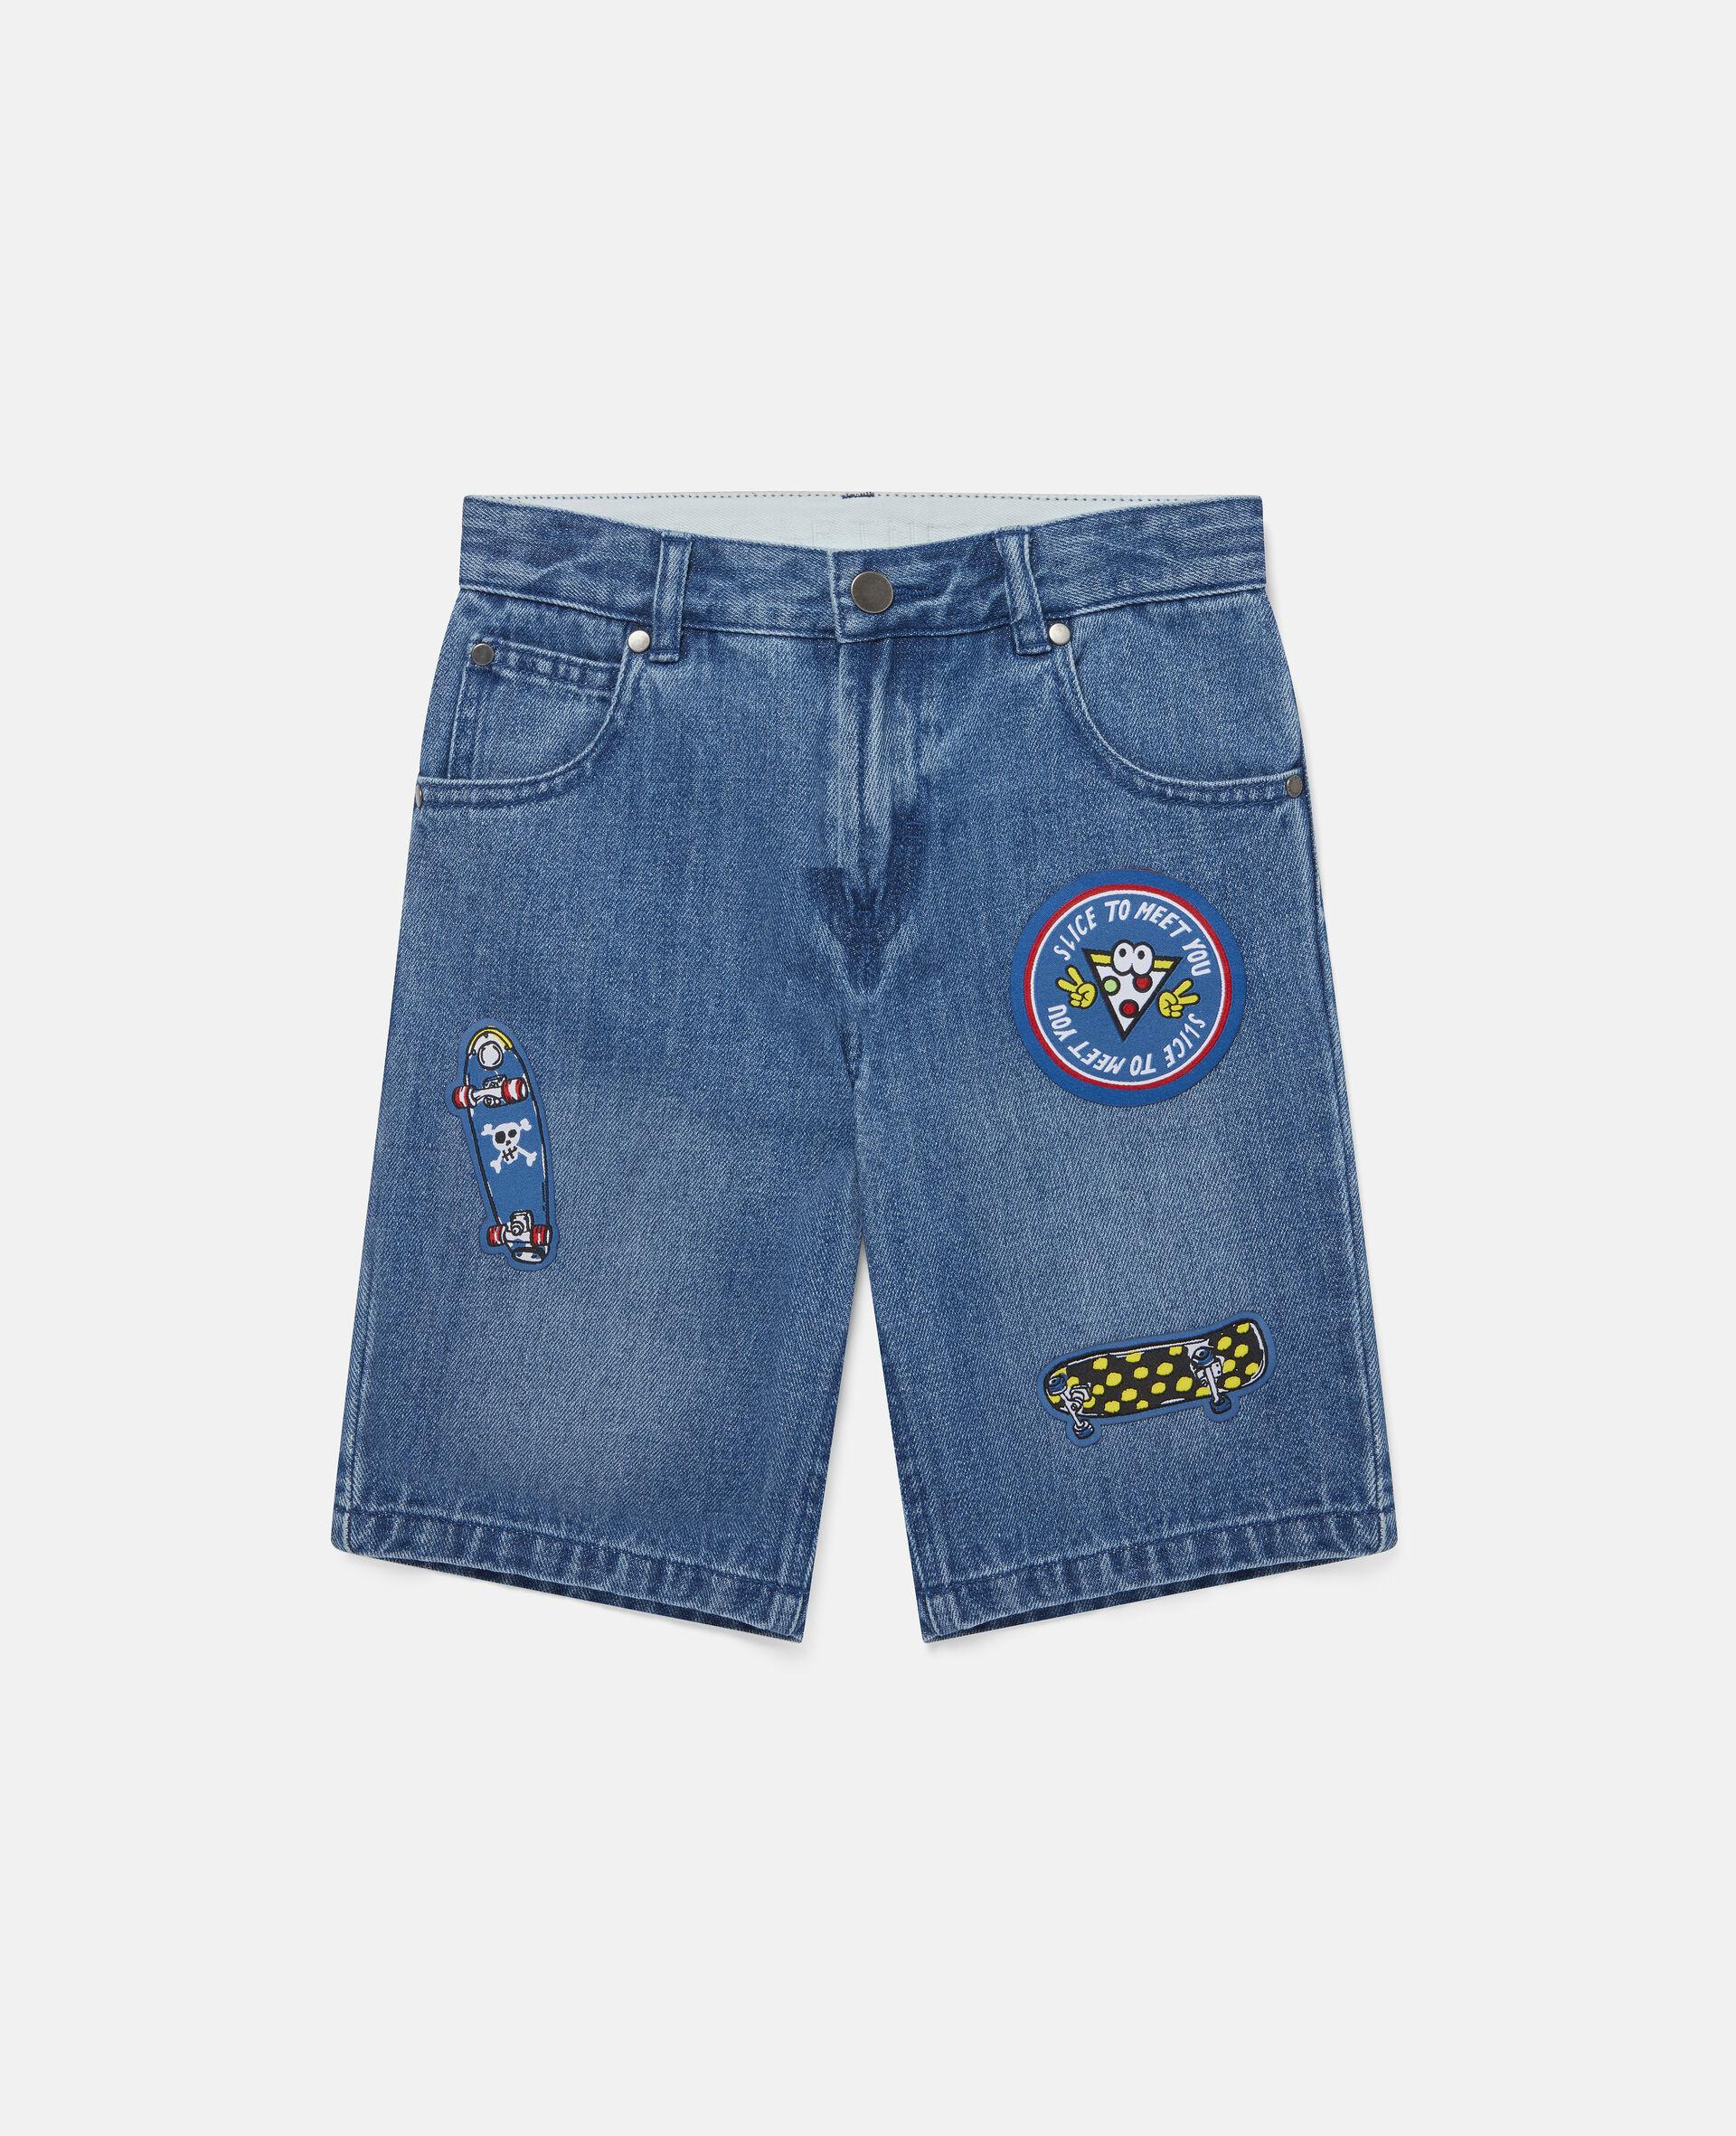 滑板徽章牛仔短裤-蓝色-large image number 0